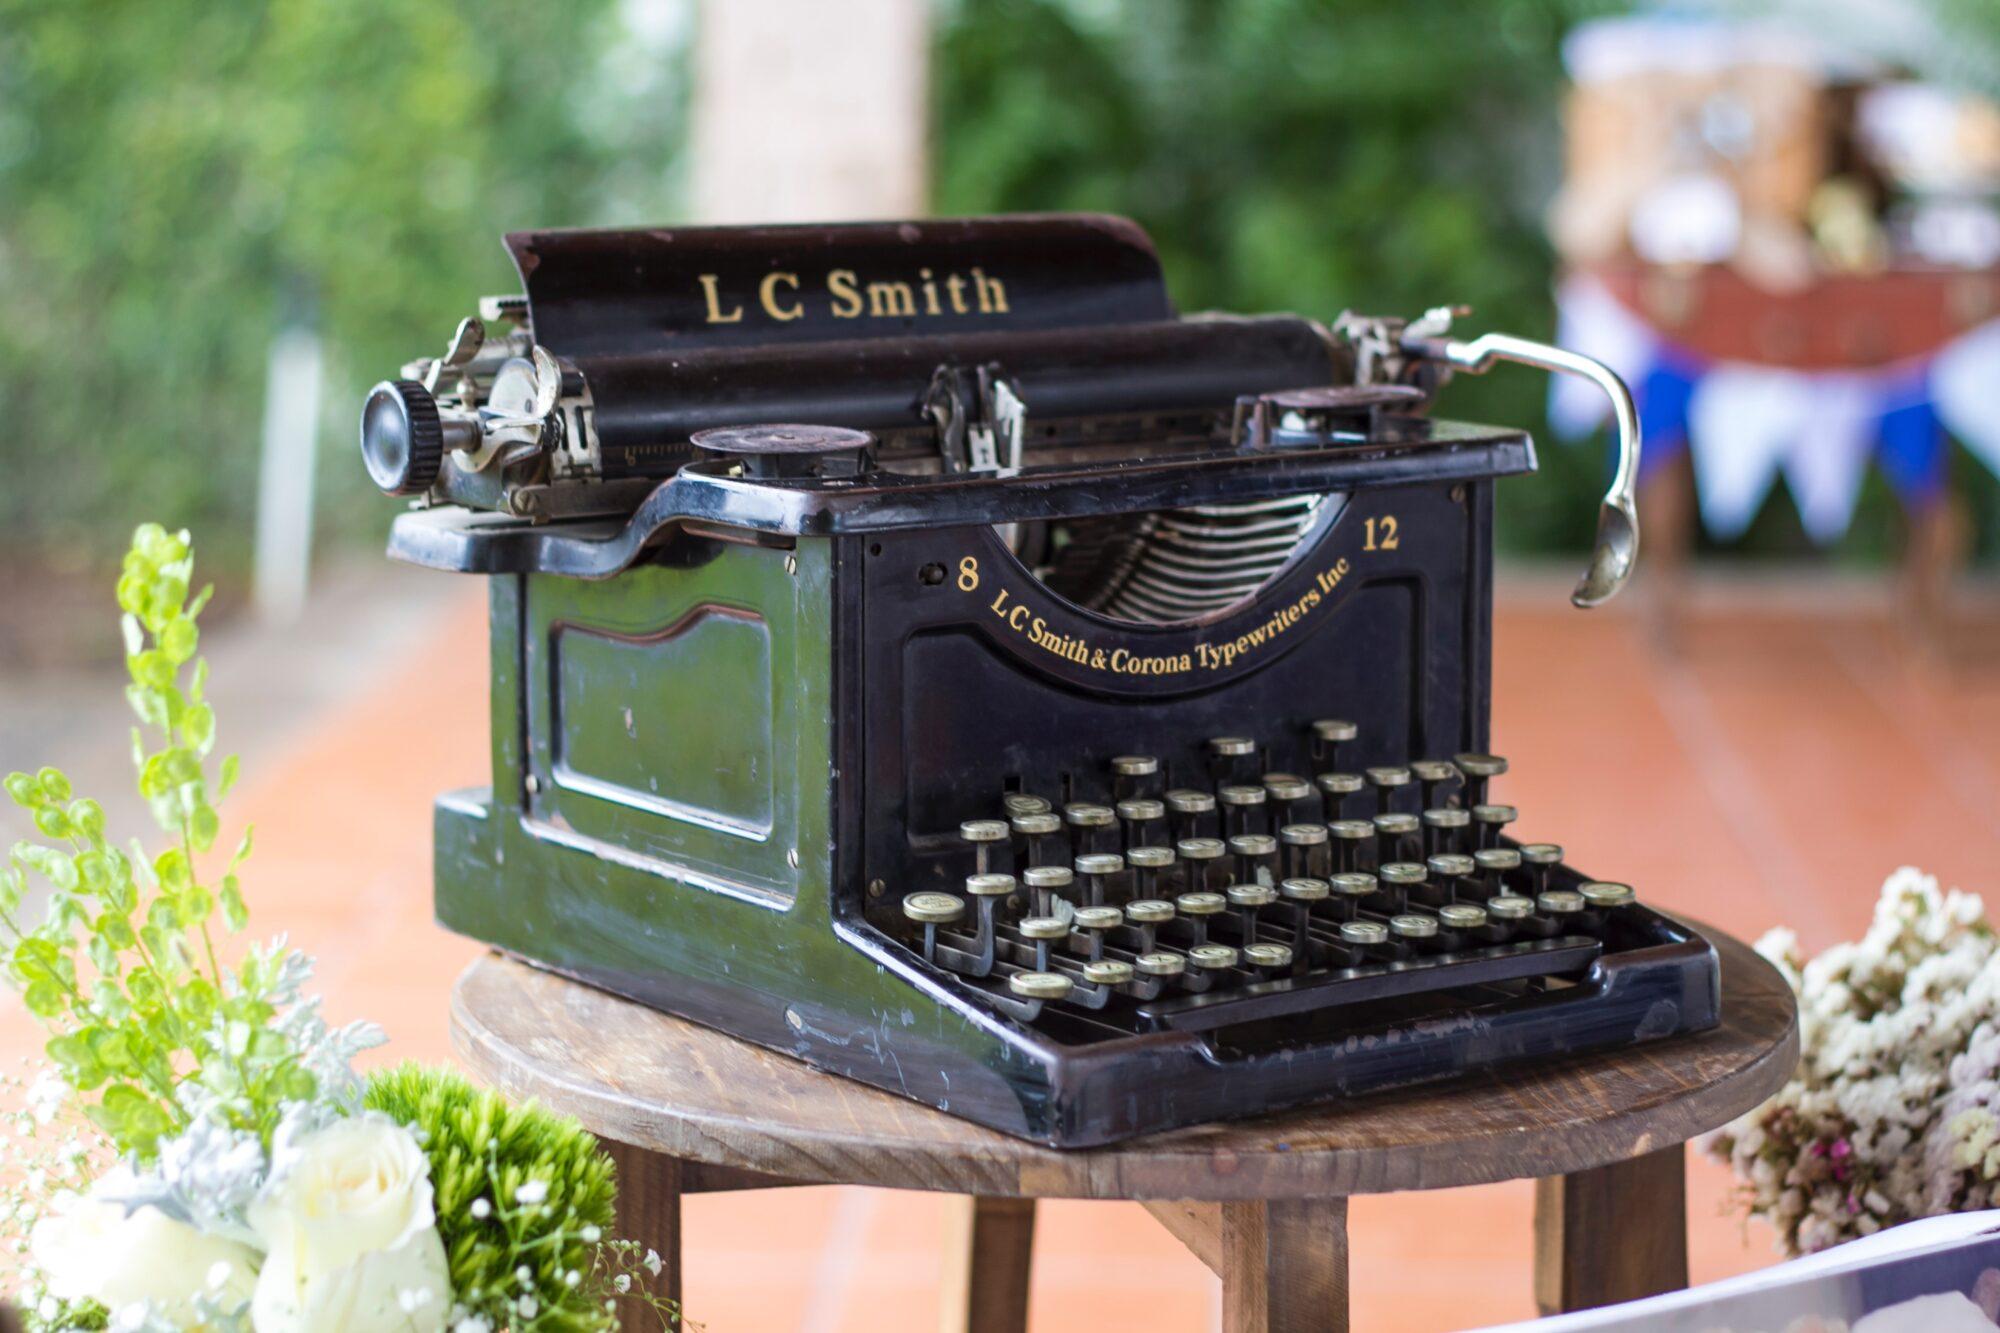 an old fashioned Smith & Corona manual typewriter